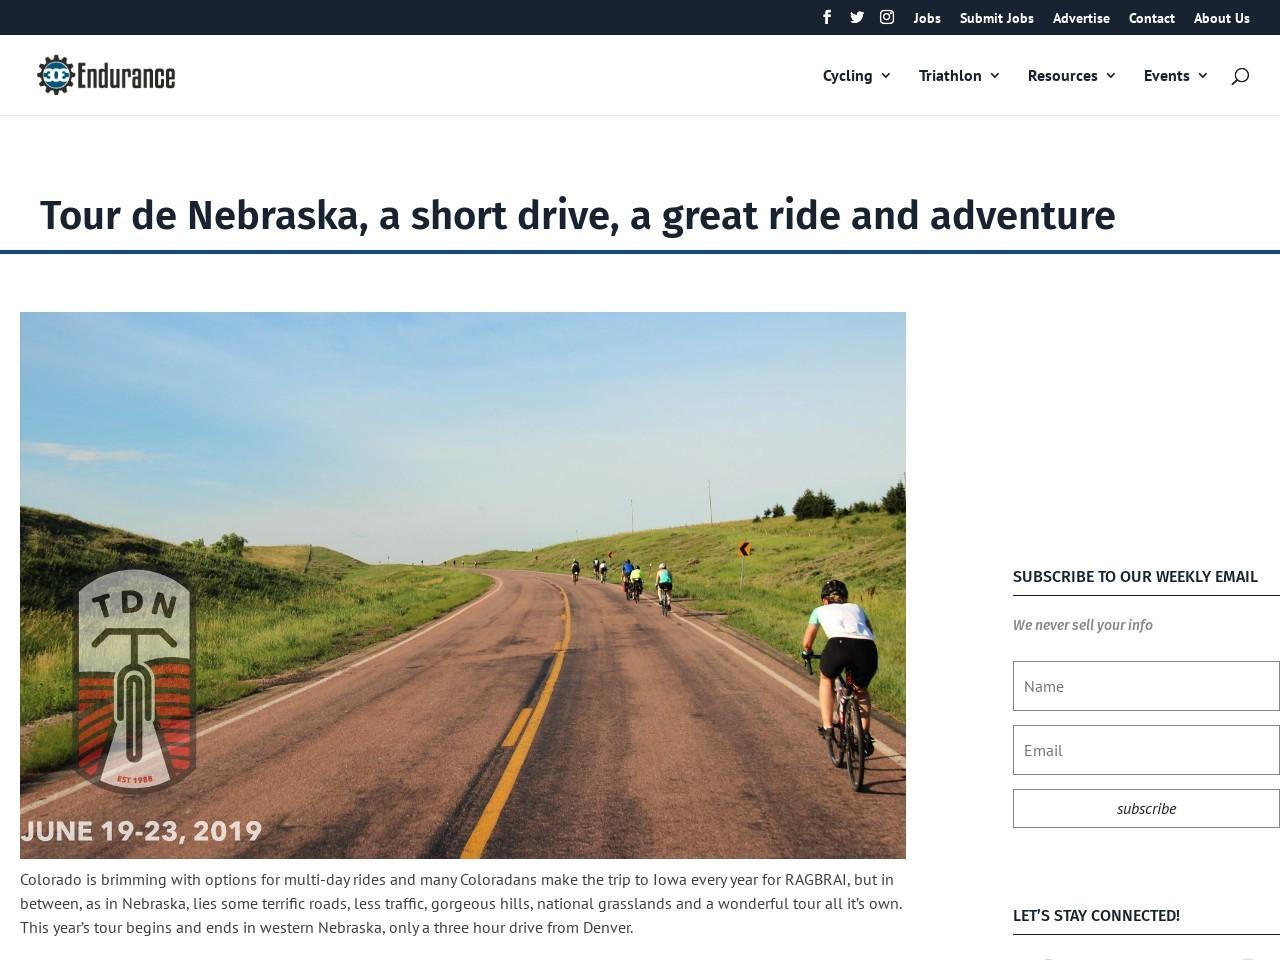 Tour de Nebraska, a short drive, a great ride and adventure